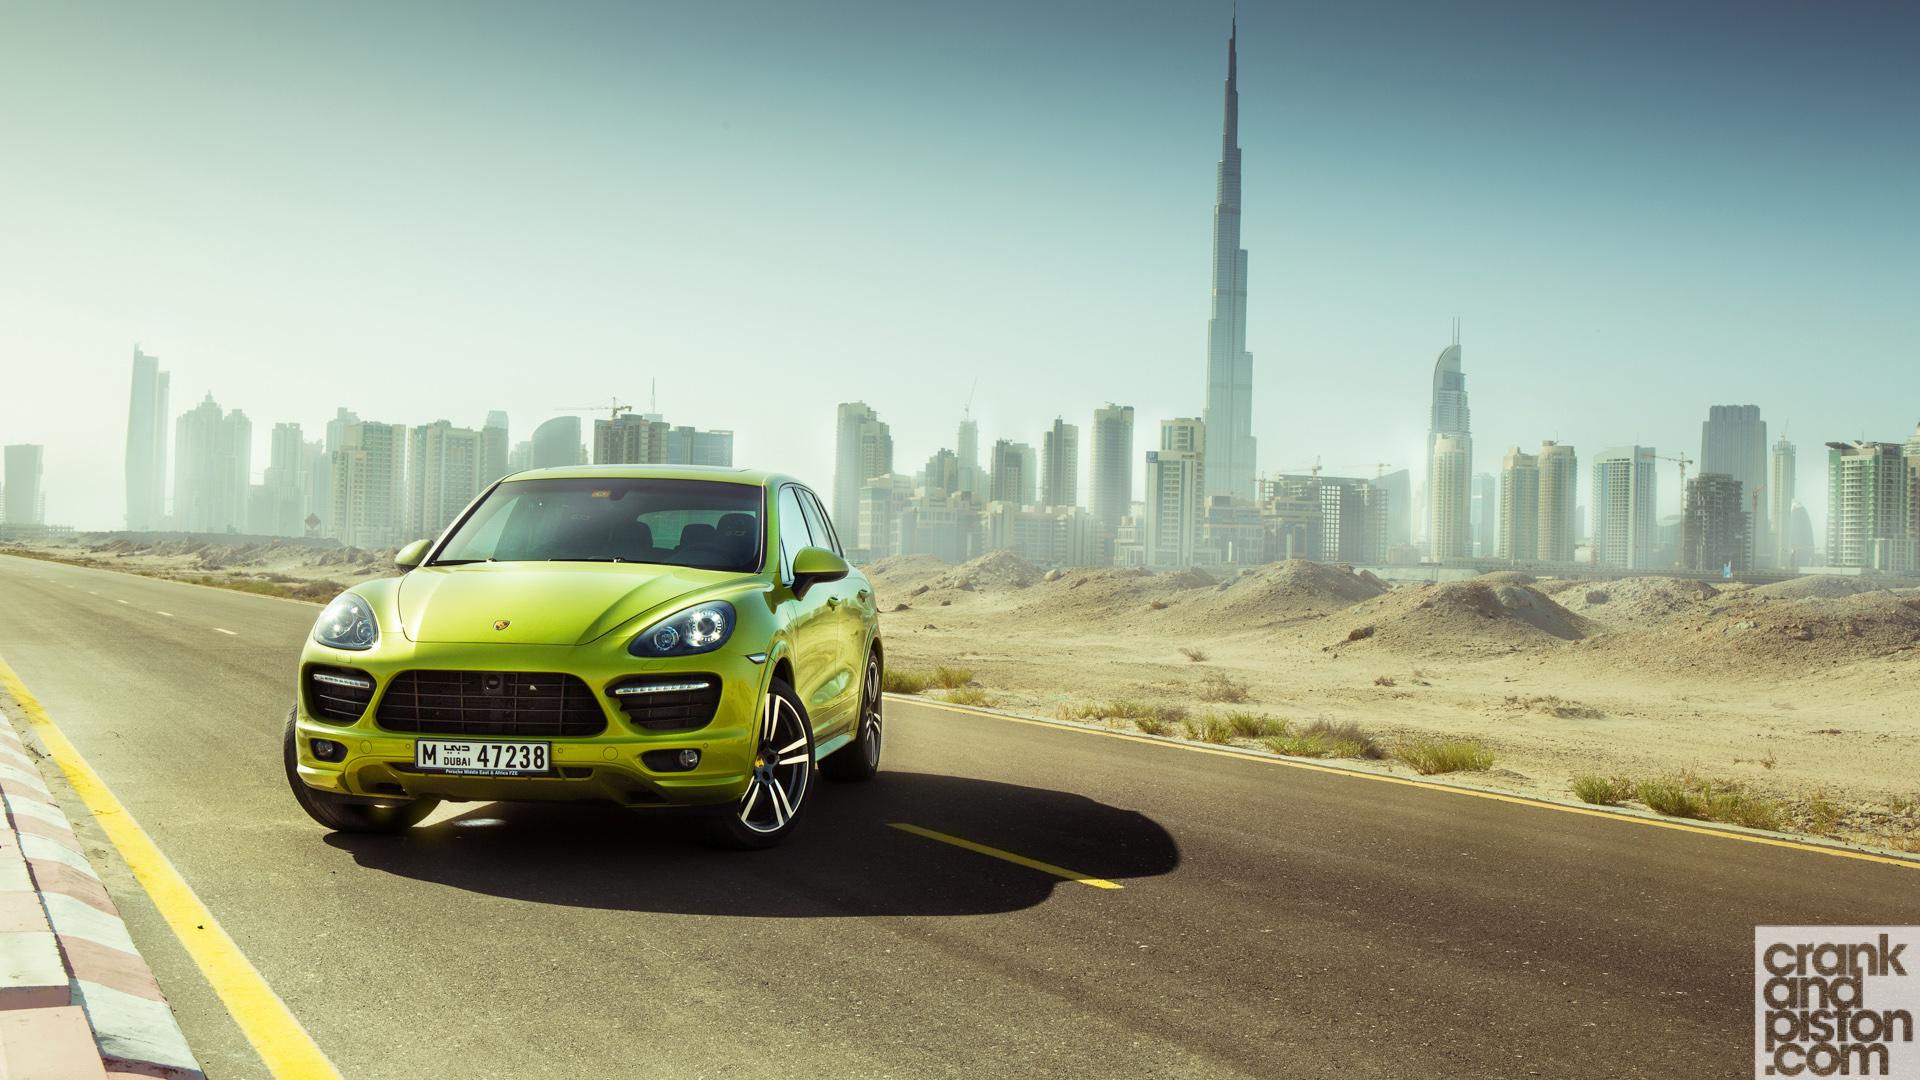 Honda City Car Hd Wallpaper Download Porsche Cayenne Gts Dubai Wallpaper Hd Car Wallpapers